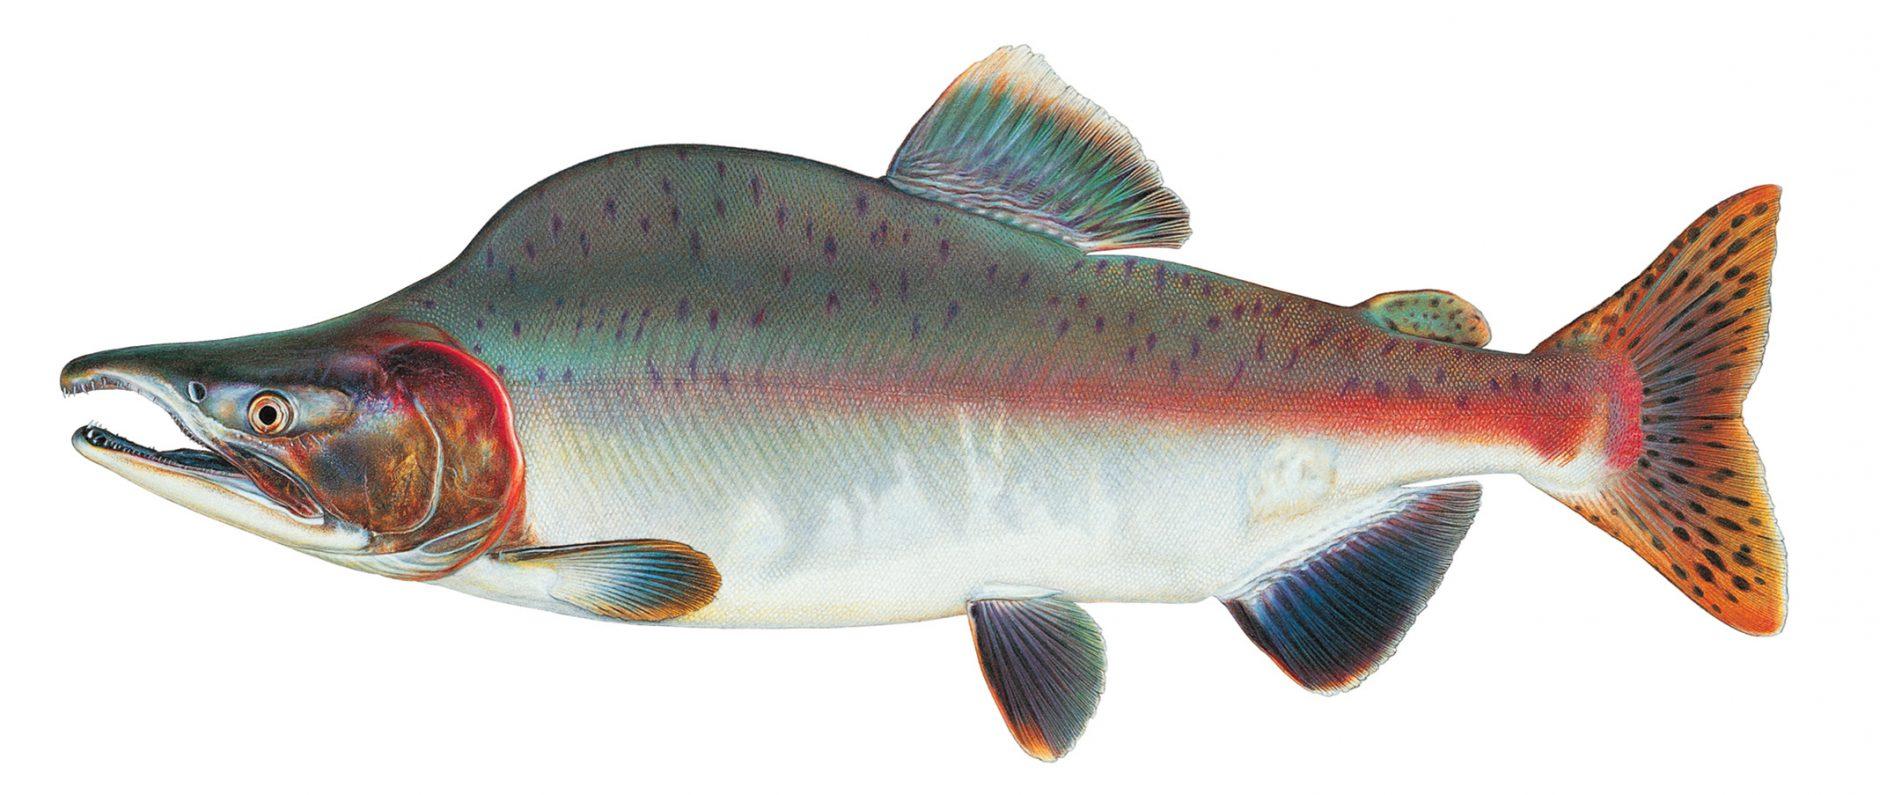 Puget sound pinks american angleramerican angler for Salmon fishing puget sound